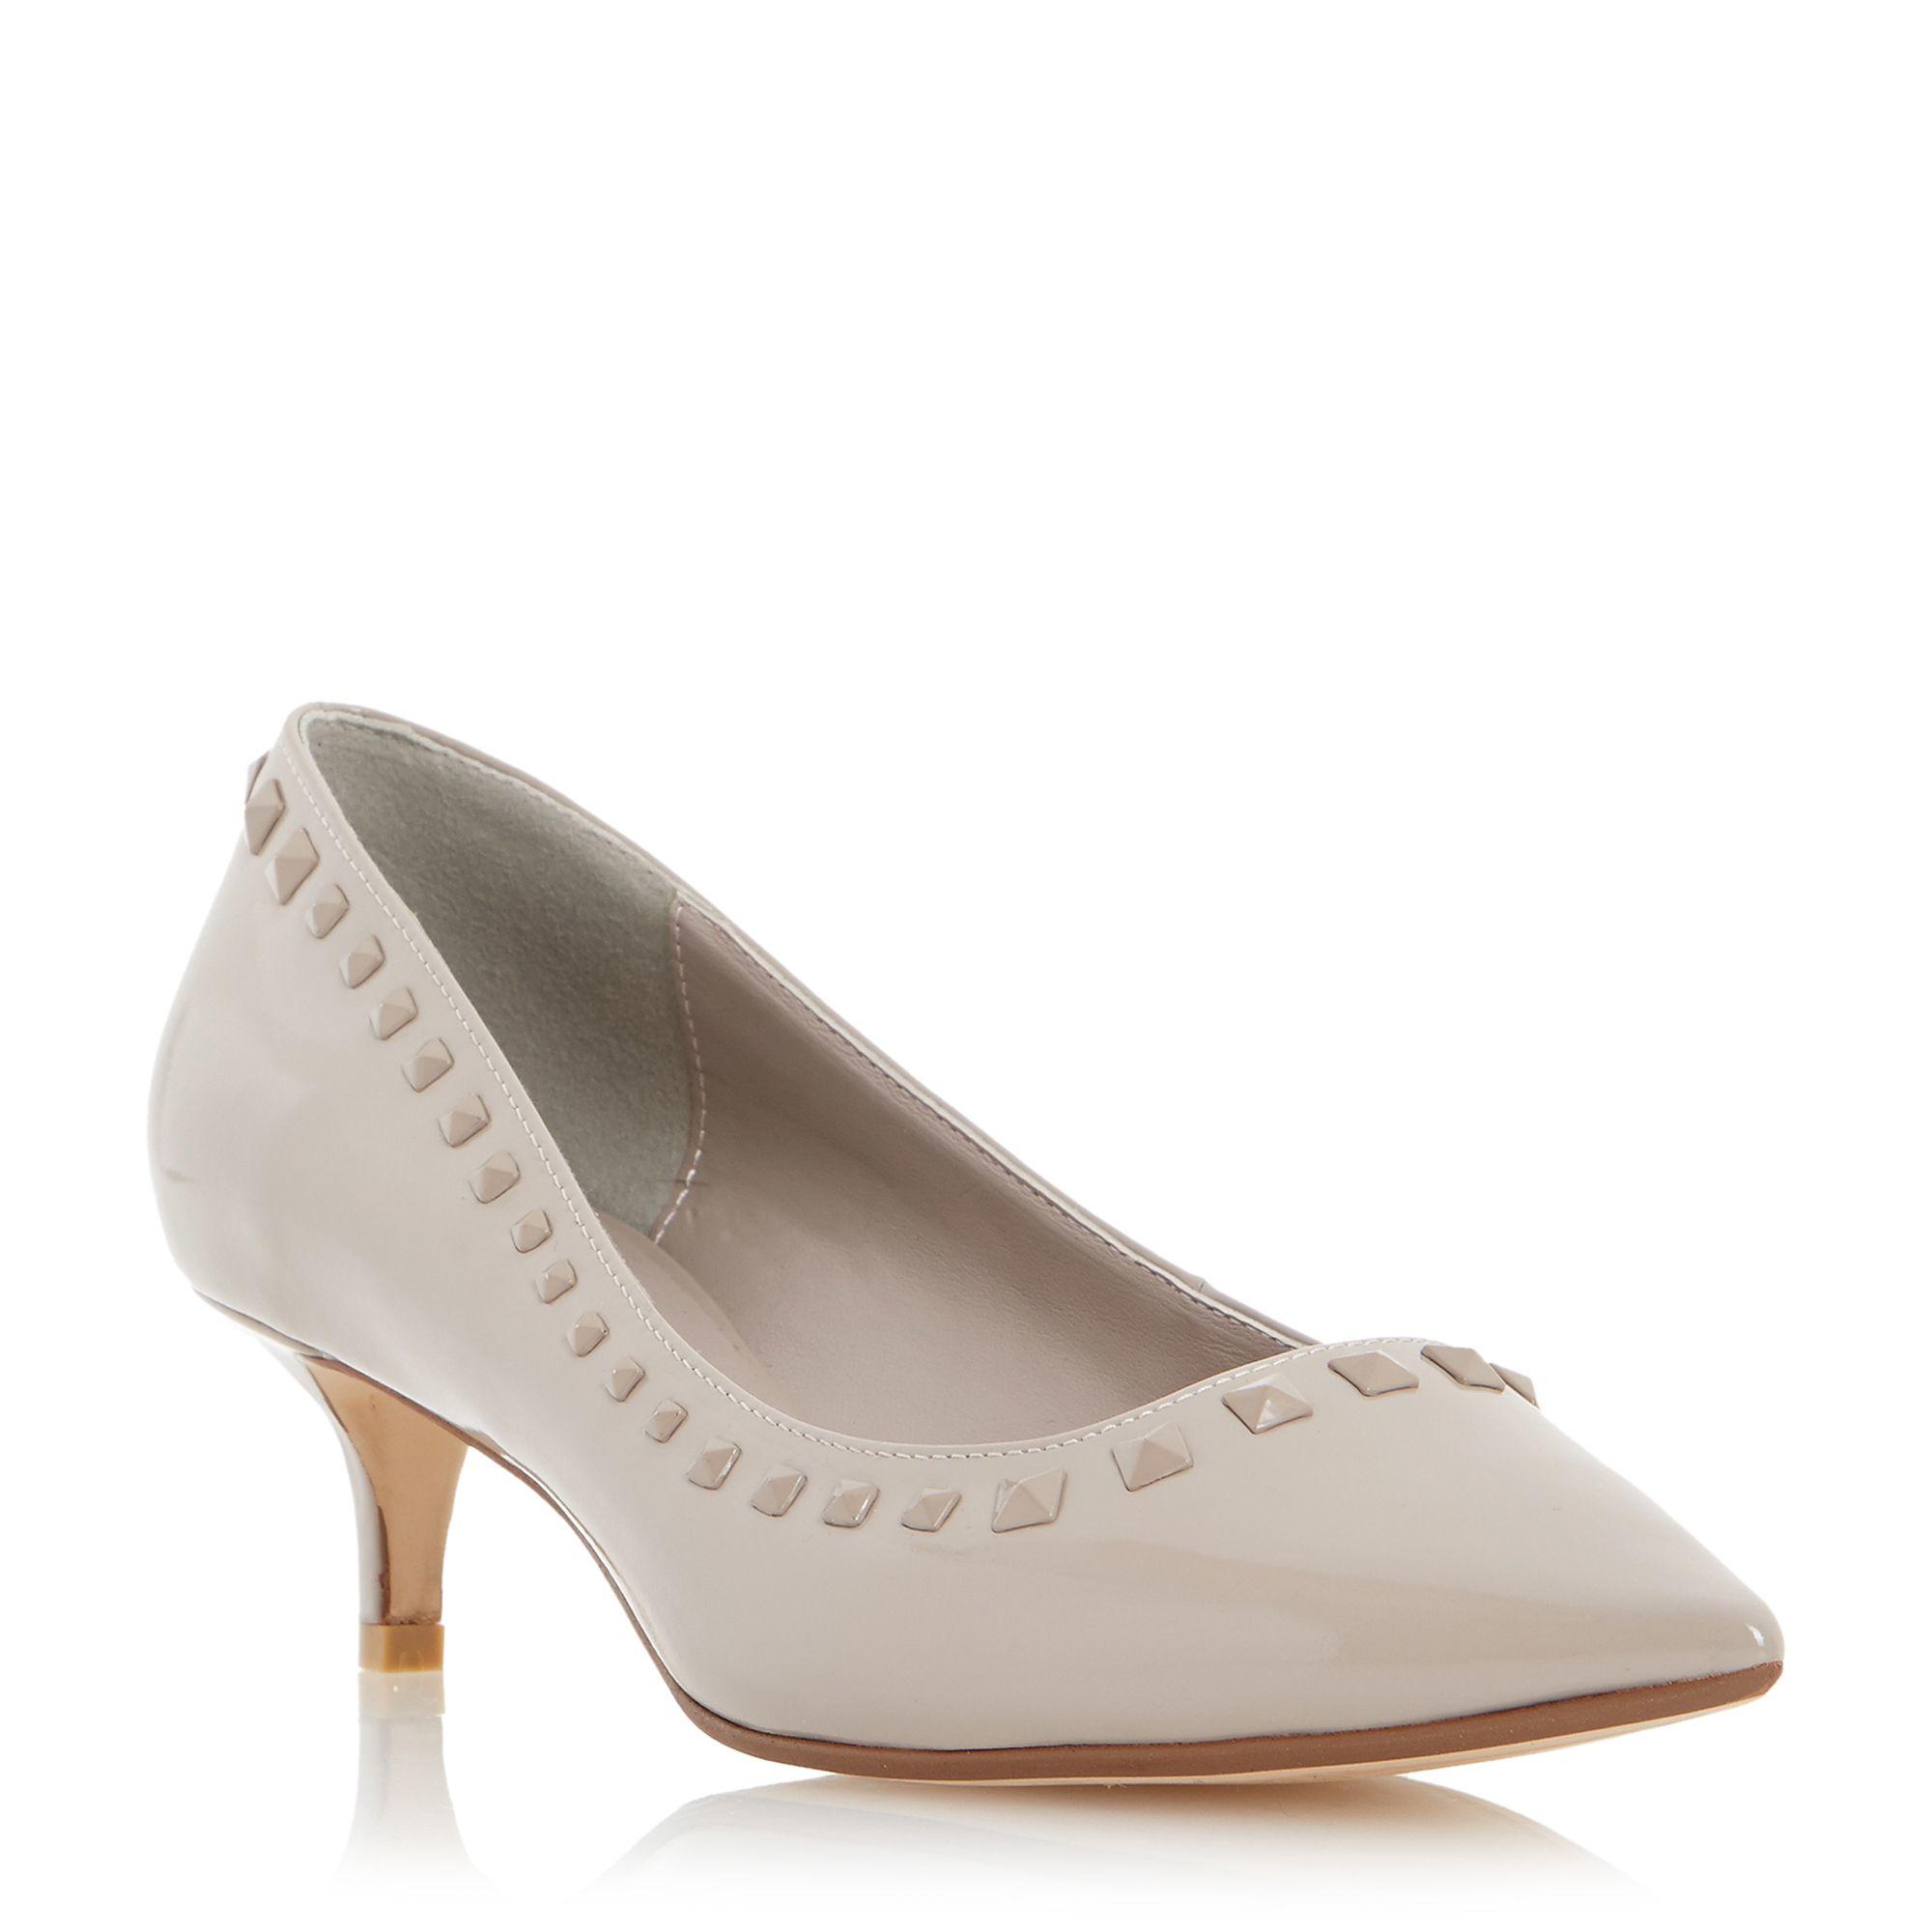 Dune Anya Pointed Toe Studded Kitten Heels | Lyst